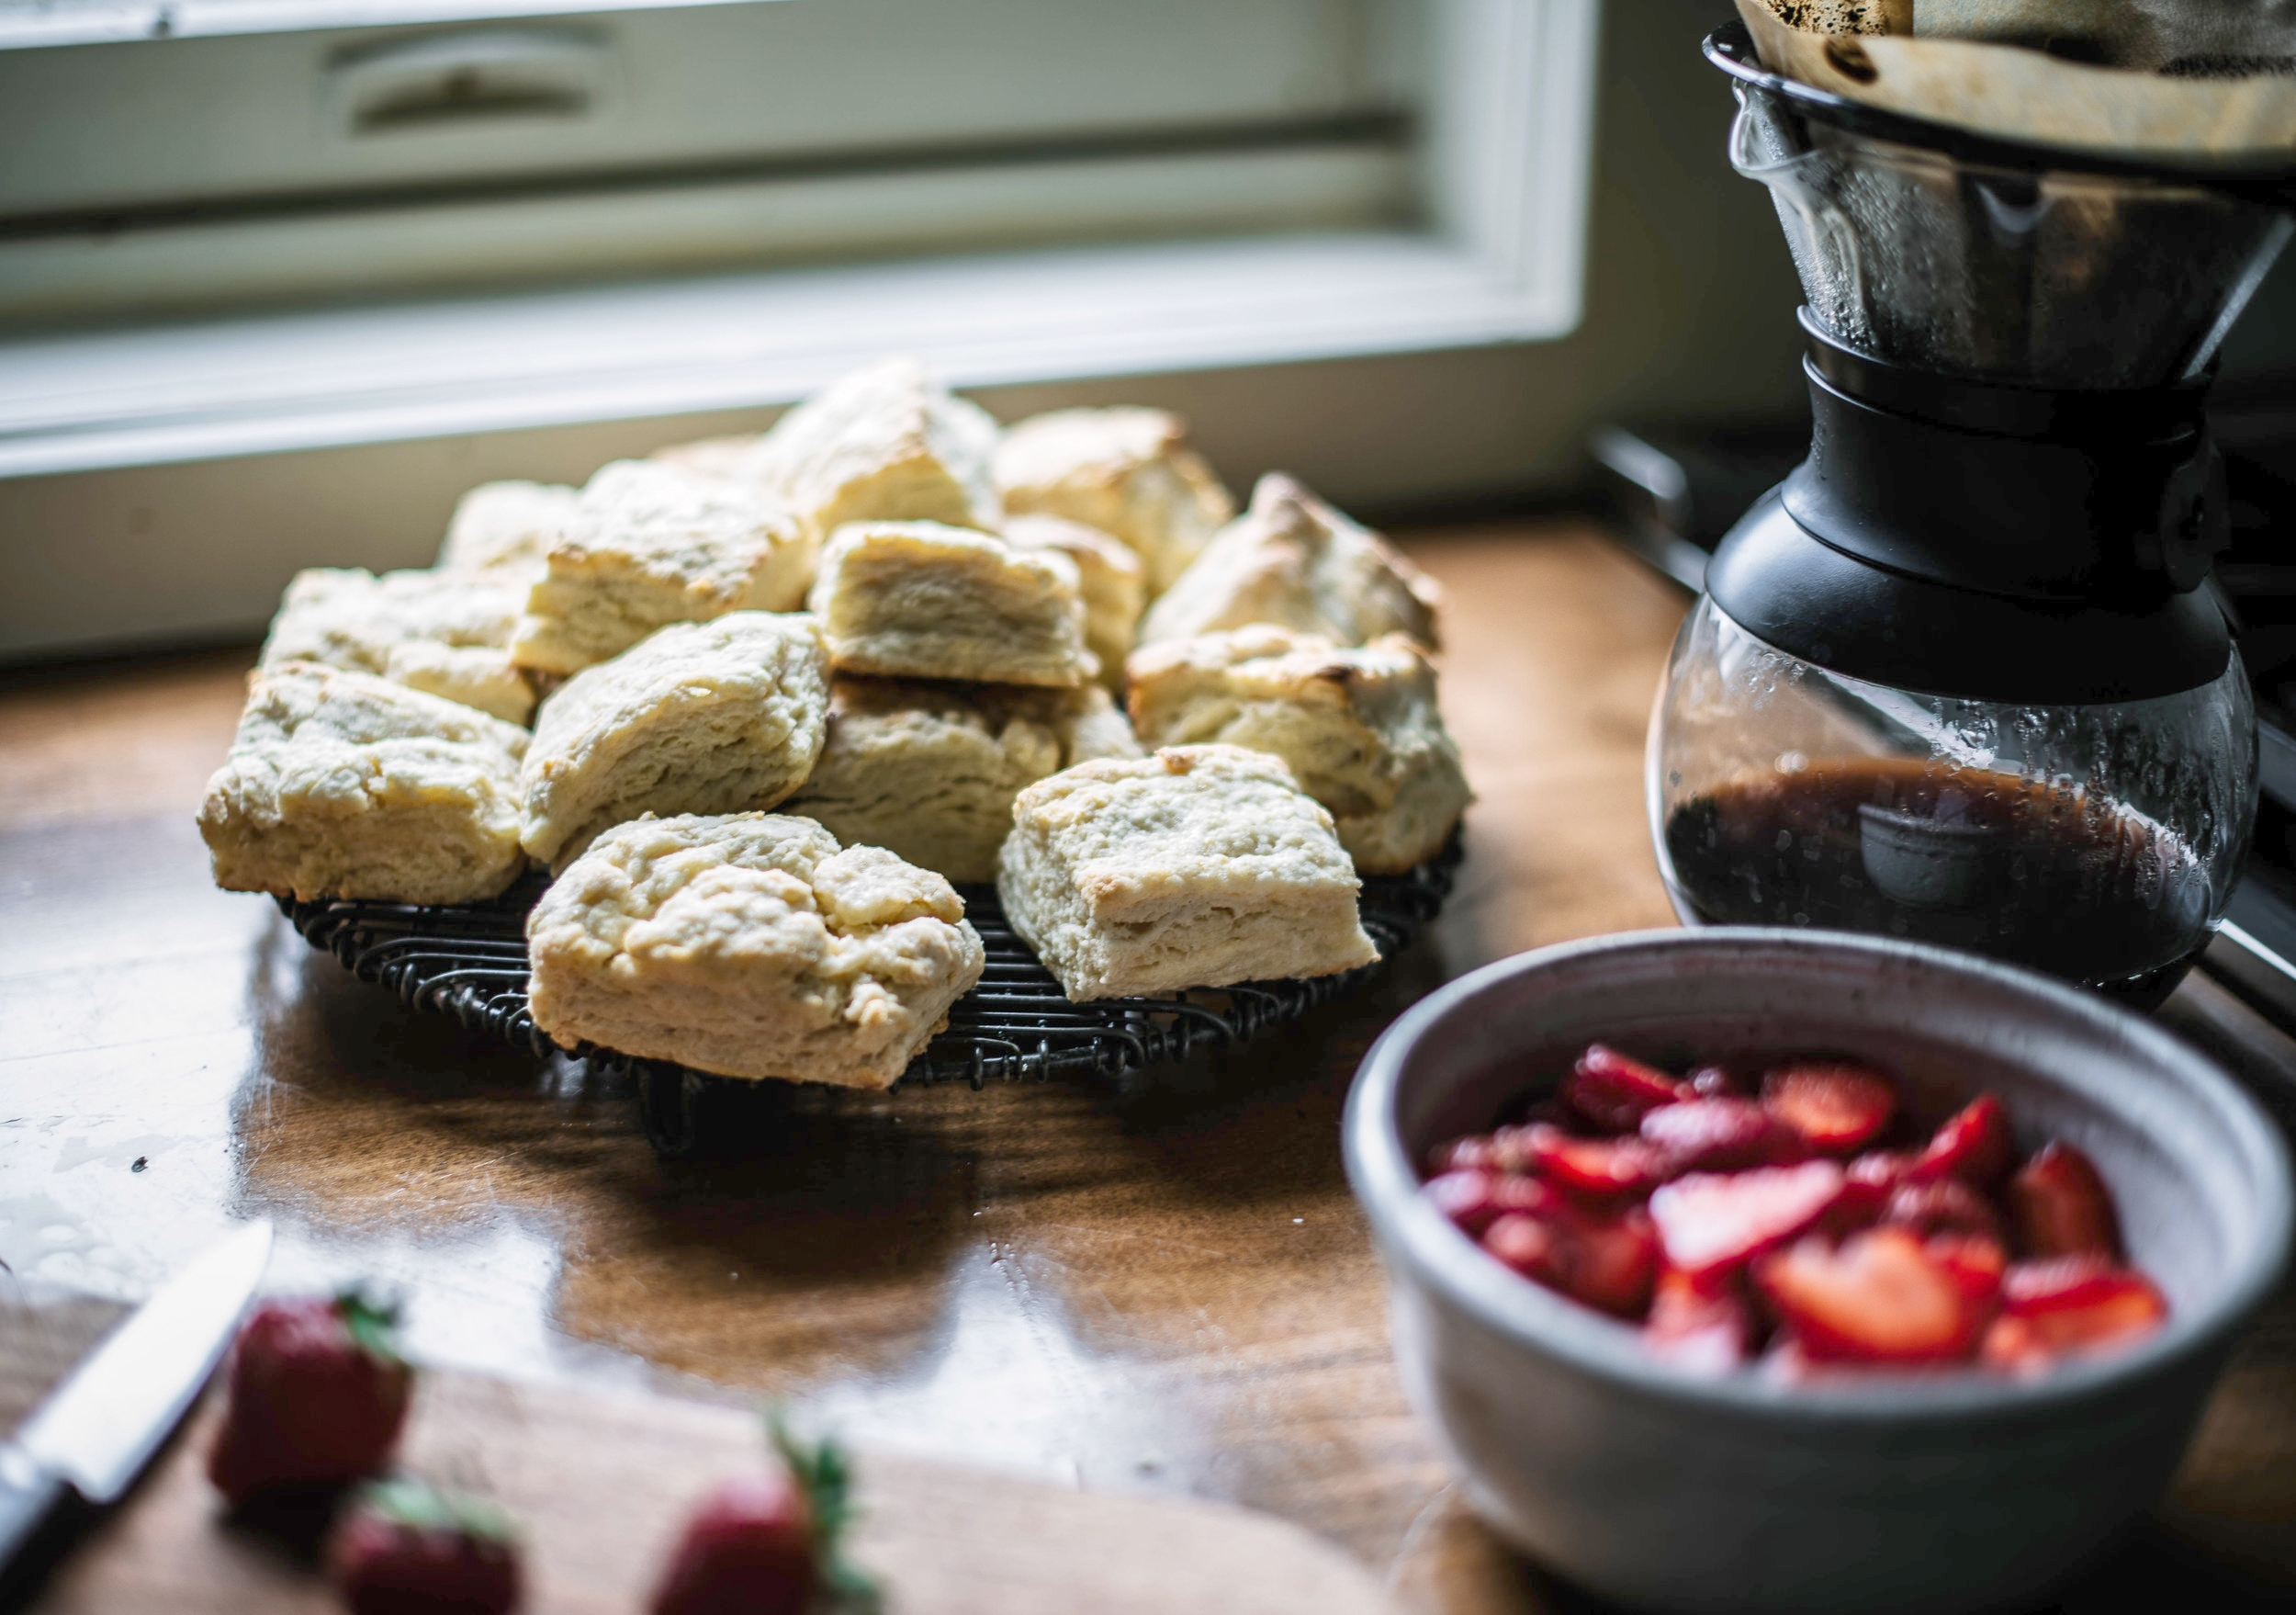 4th of July Dessert Strawberry Shortcake